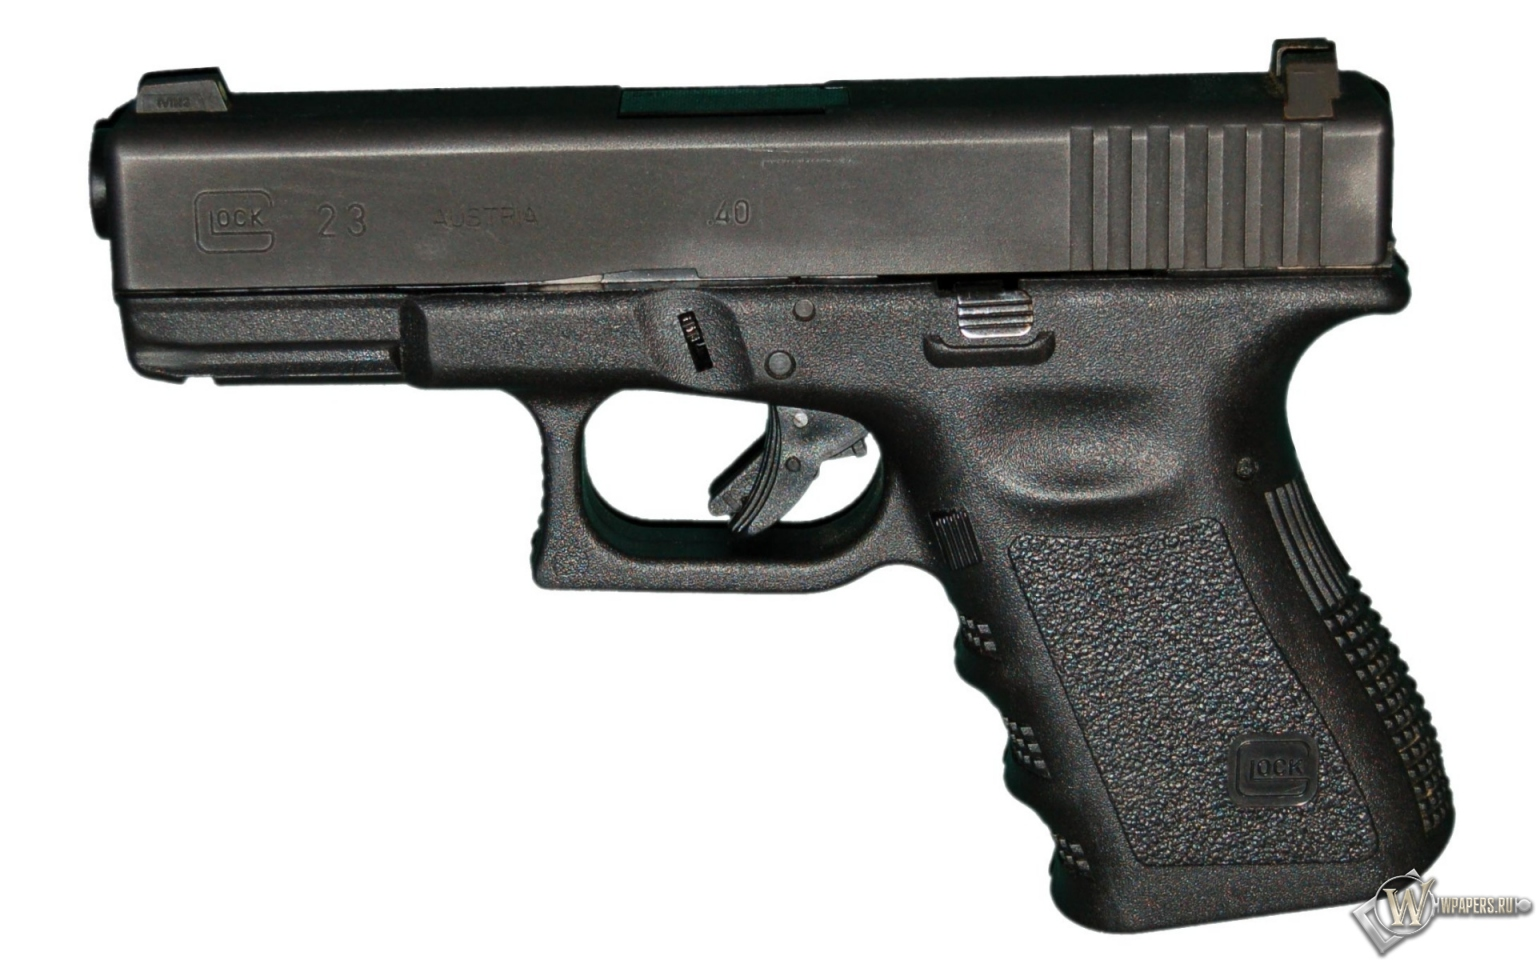 Glock 23 1536x960